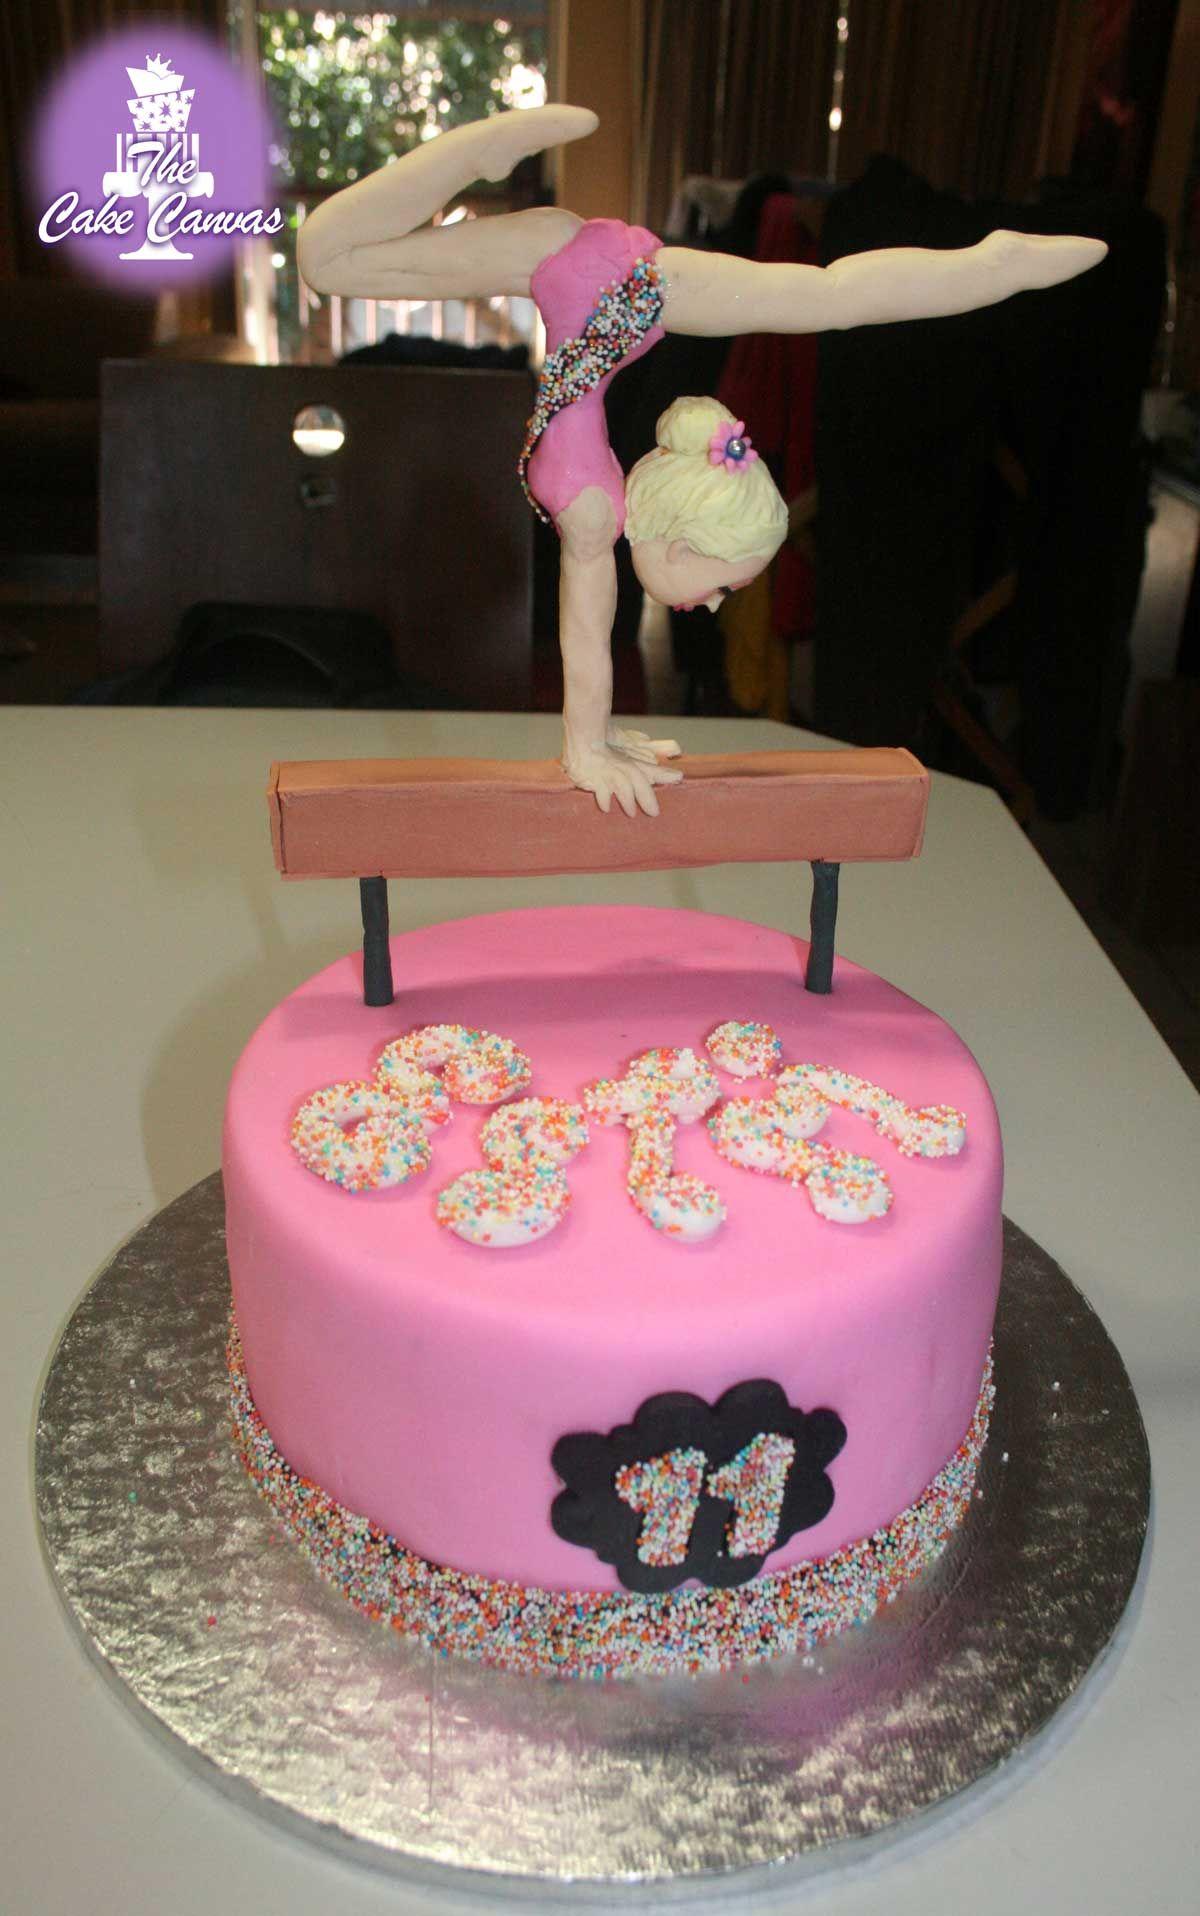 Gymnastic Cake The Cake Canvas